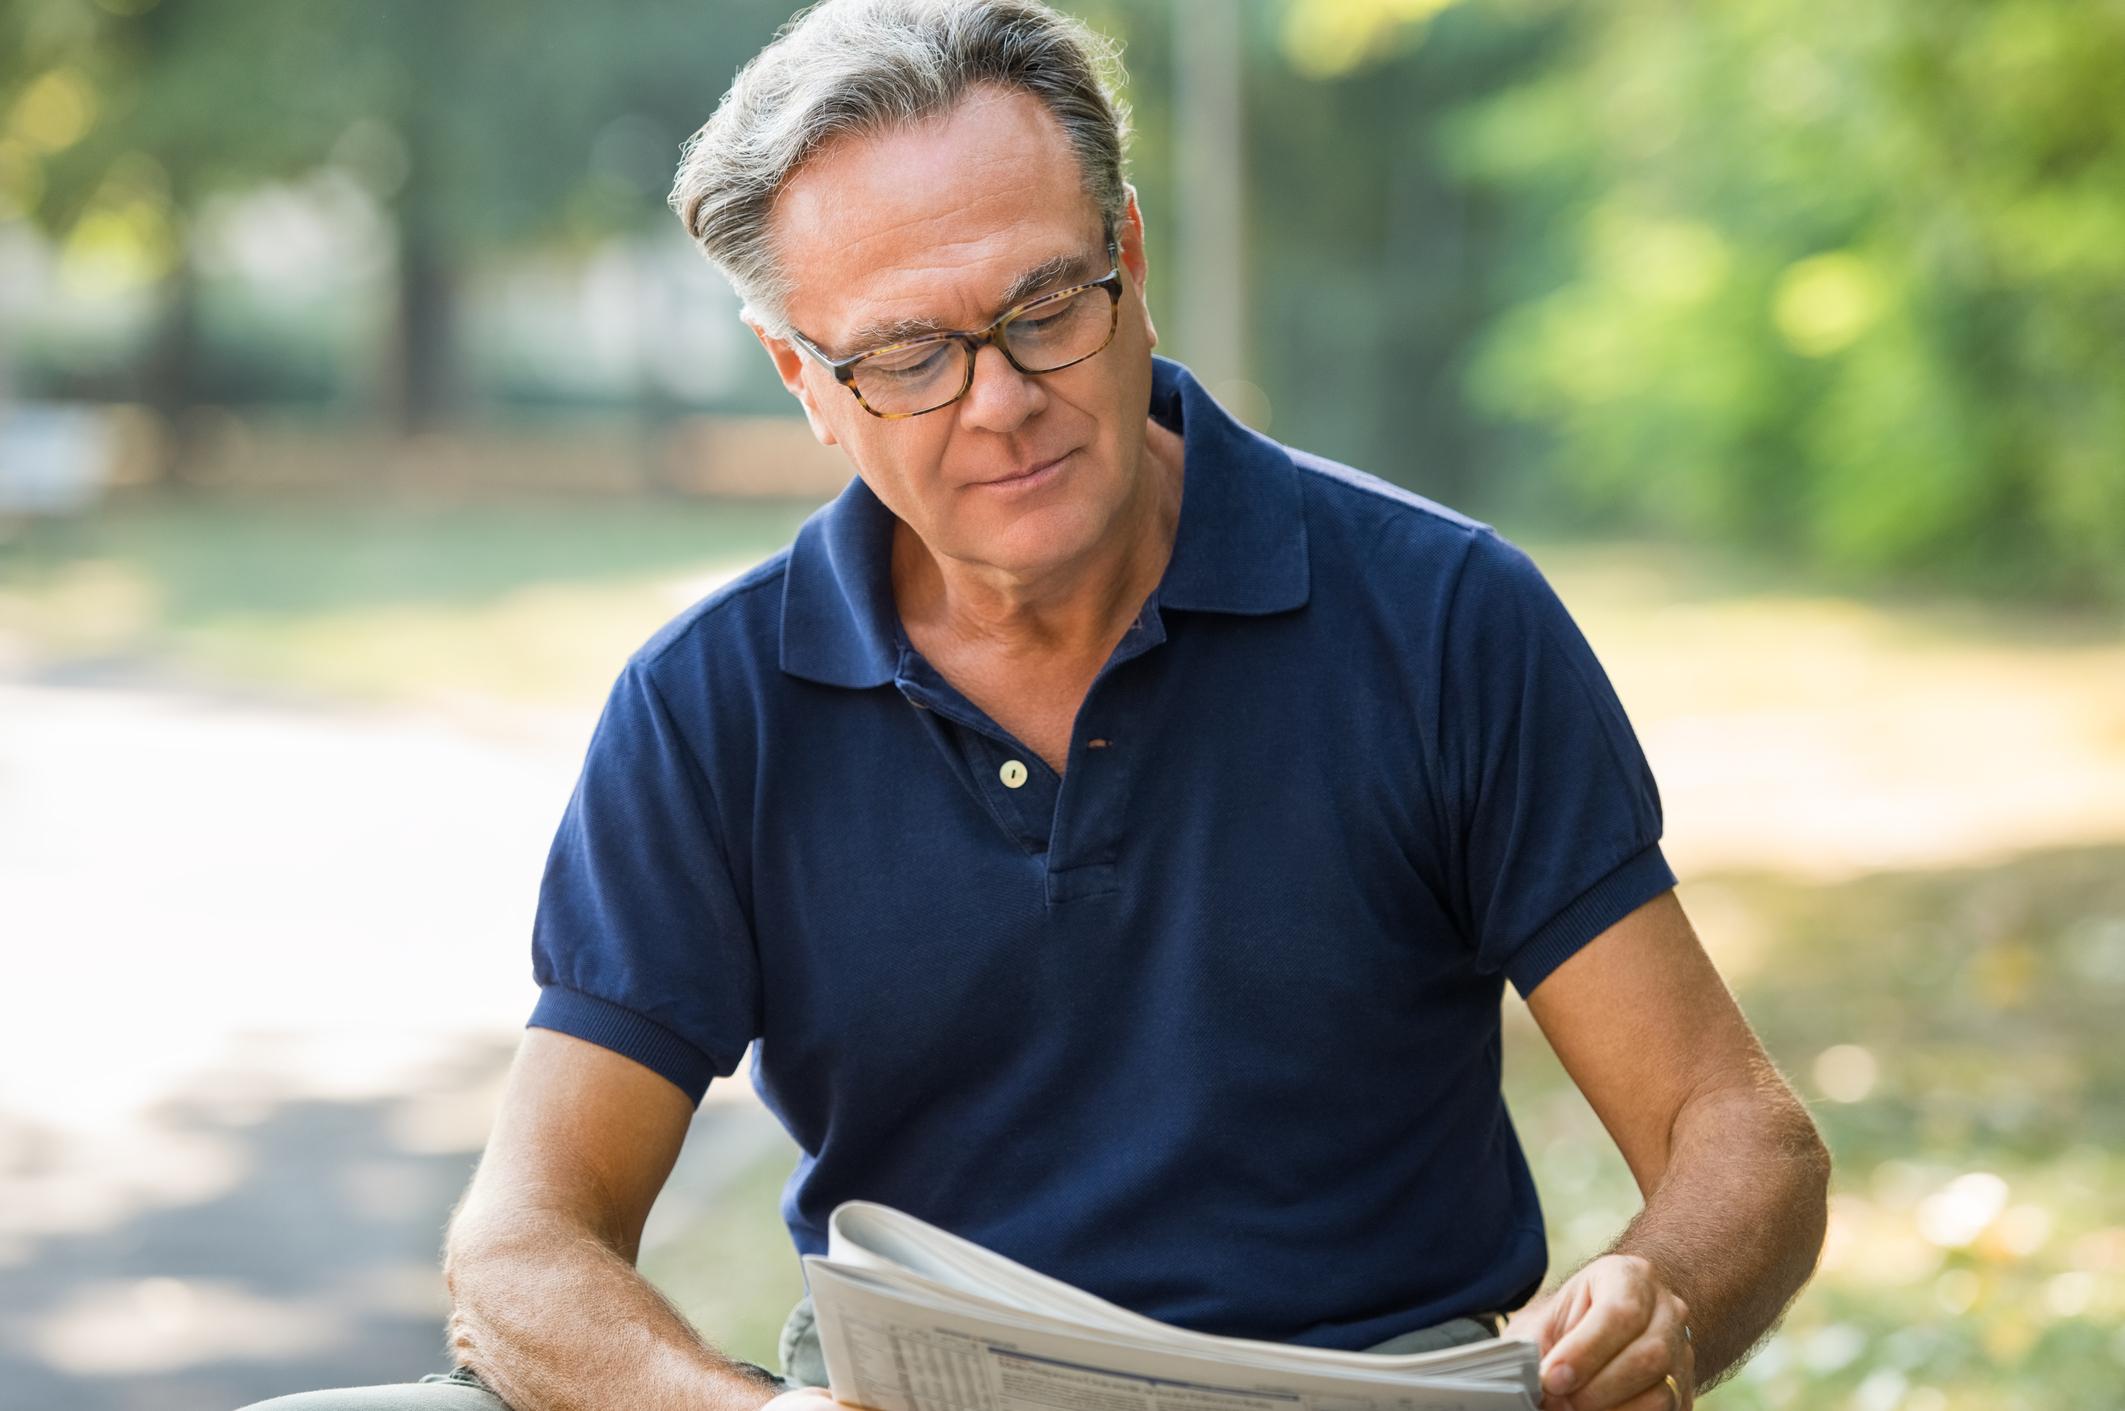 Older man reading newspaper outdoors.